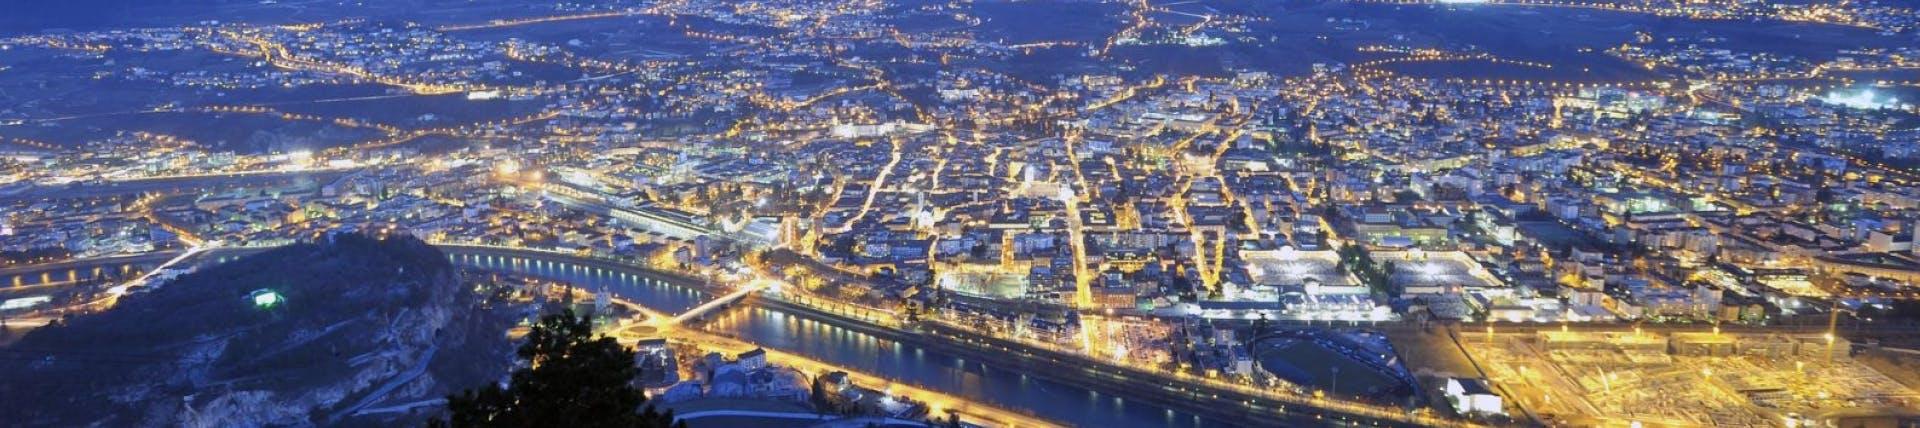 Picture of Trento